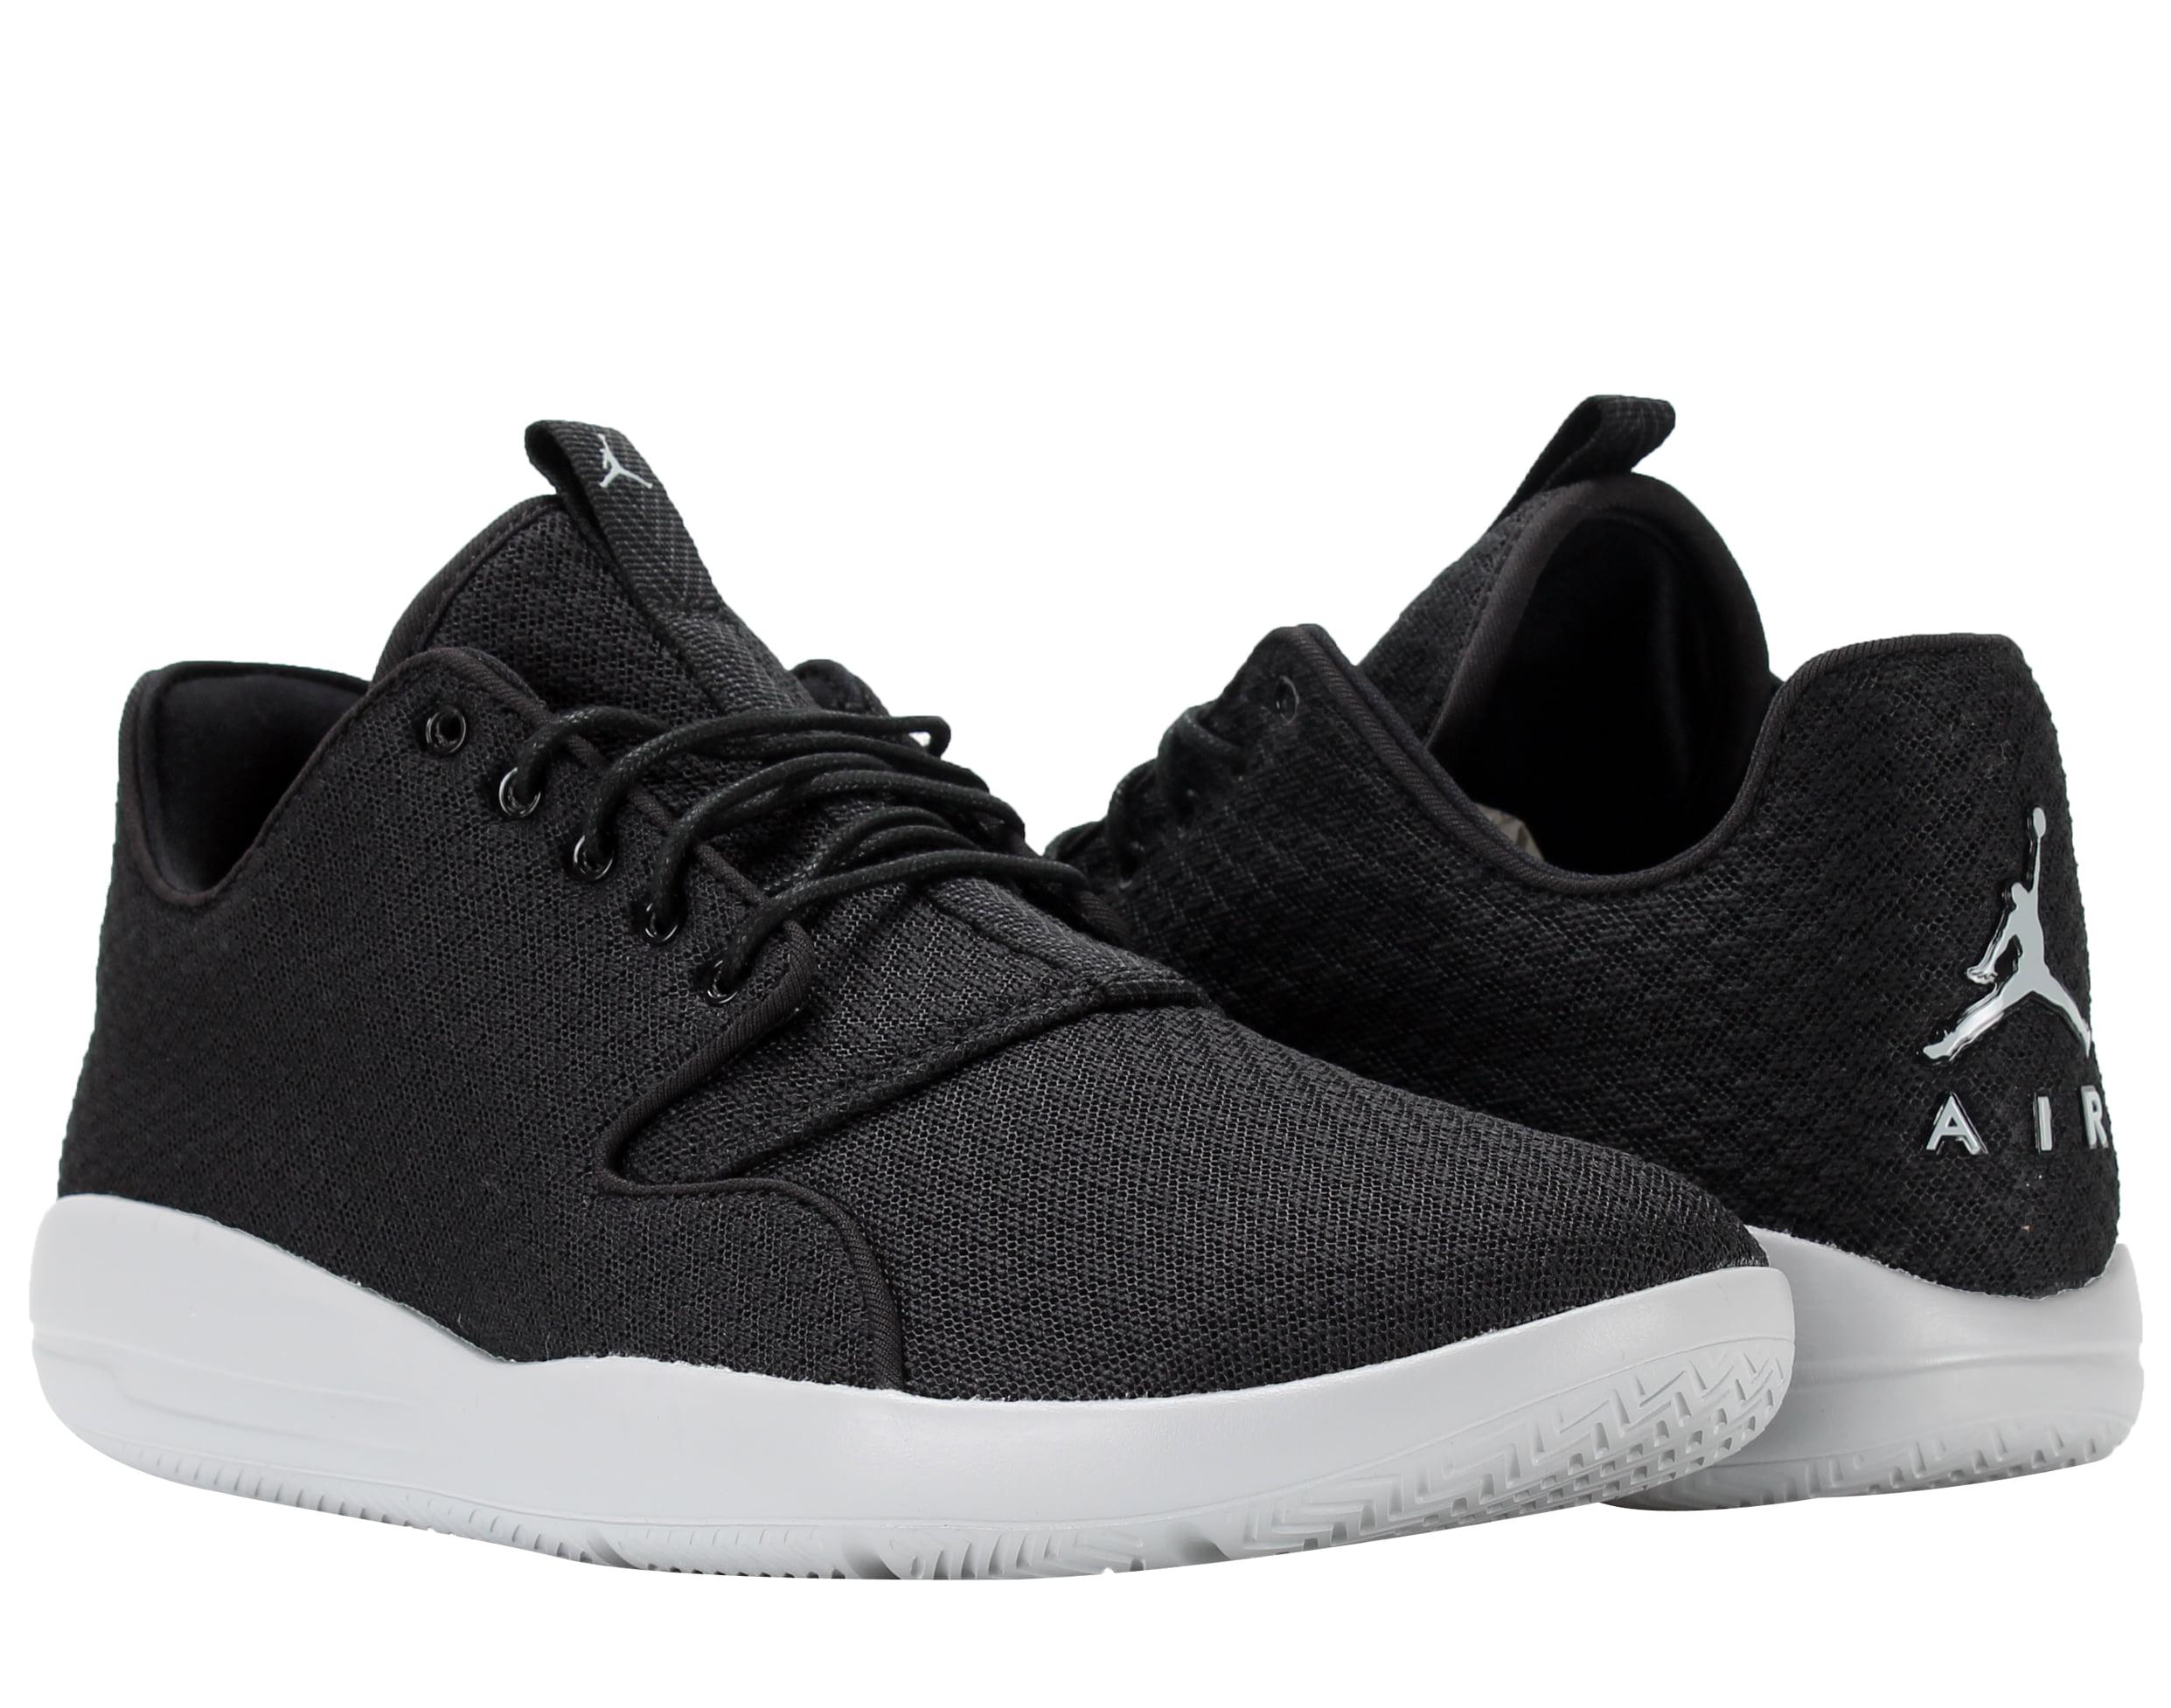 Nike Air Jordan Eclipse Black/Wolf Grey